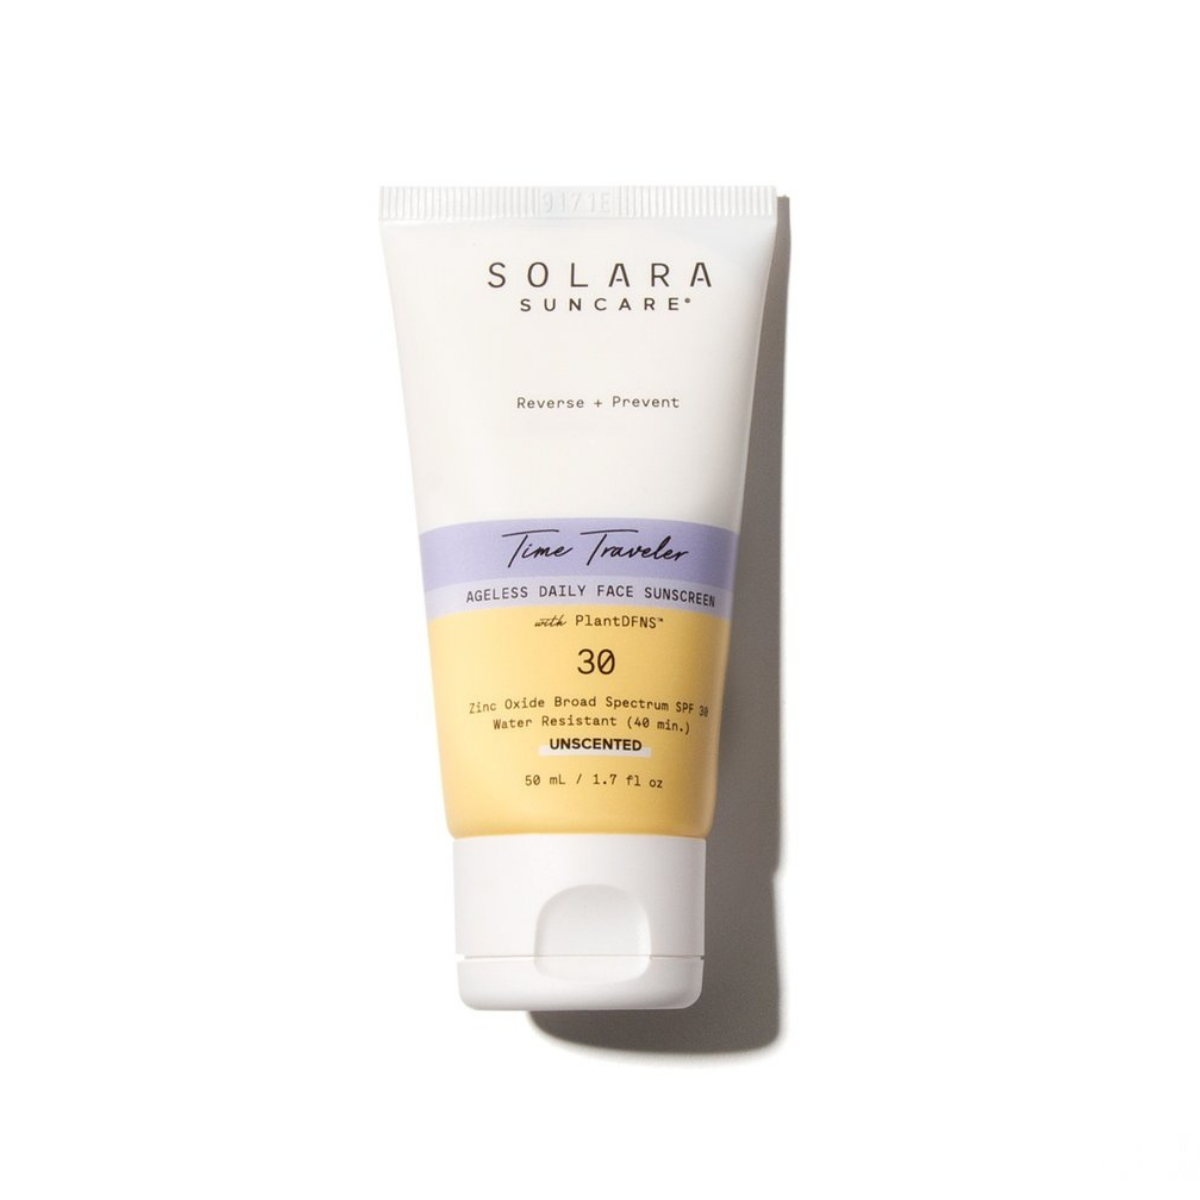 Time Traveler Ageless Daily Face Sunscreen — 1.7 fl oz